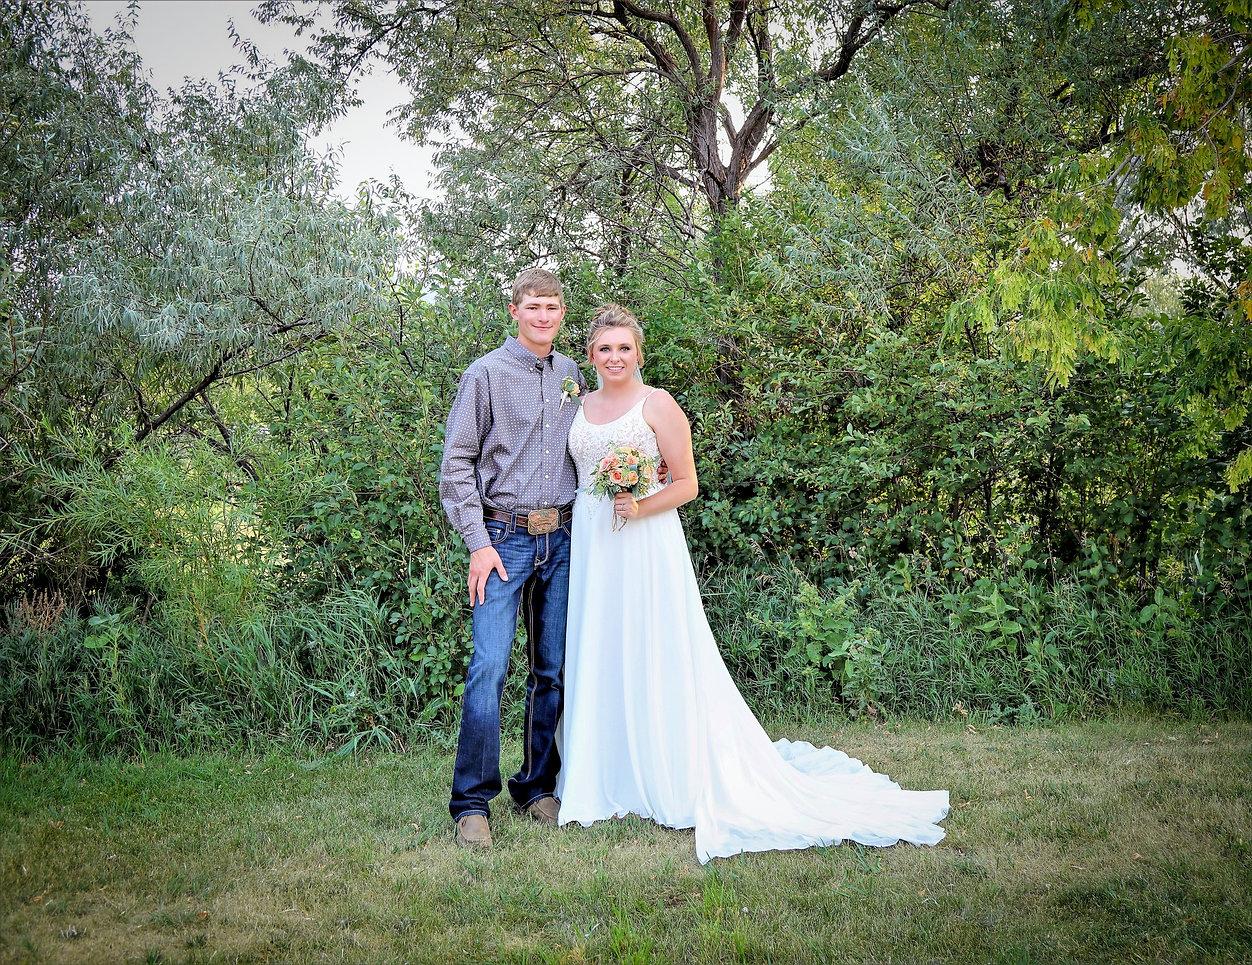 Bride%20and%20groom5_edited.jpg